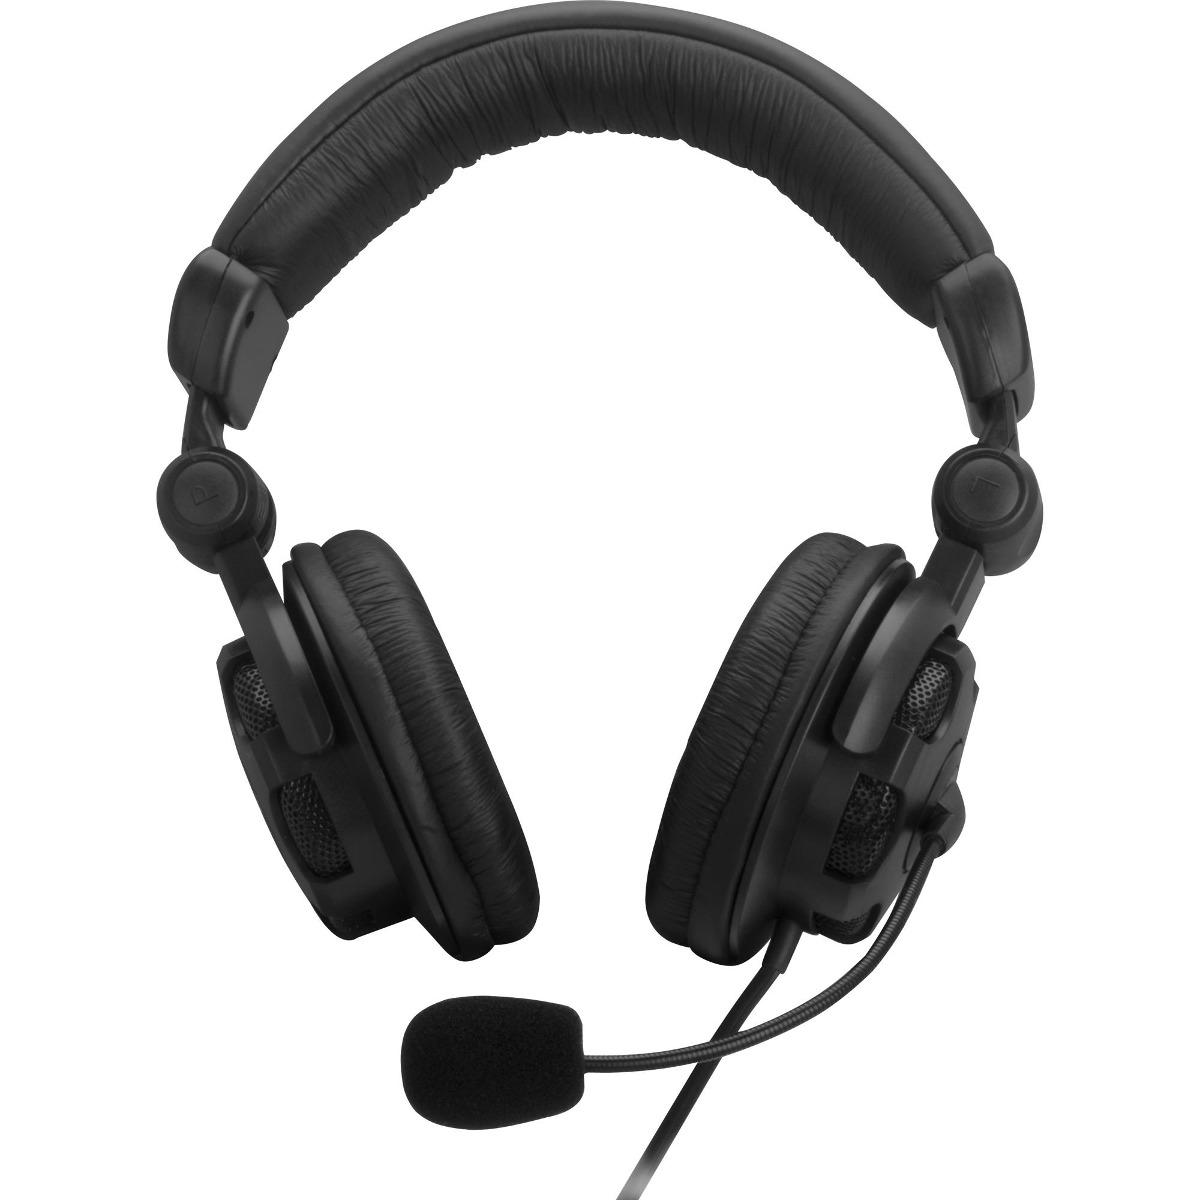 Fone De Ouvido Fortrek Hs-311 - Preto Com Microfone